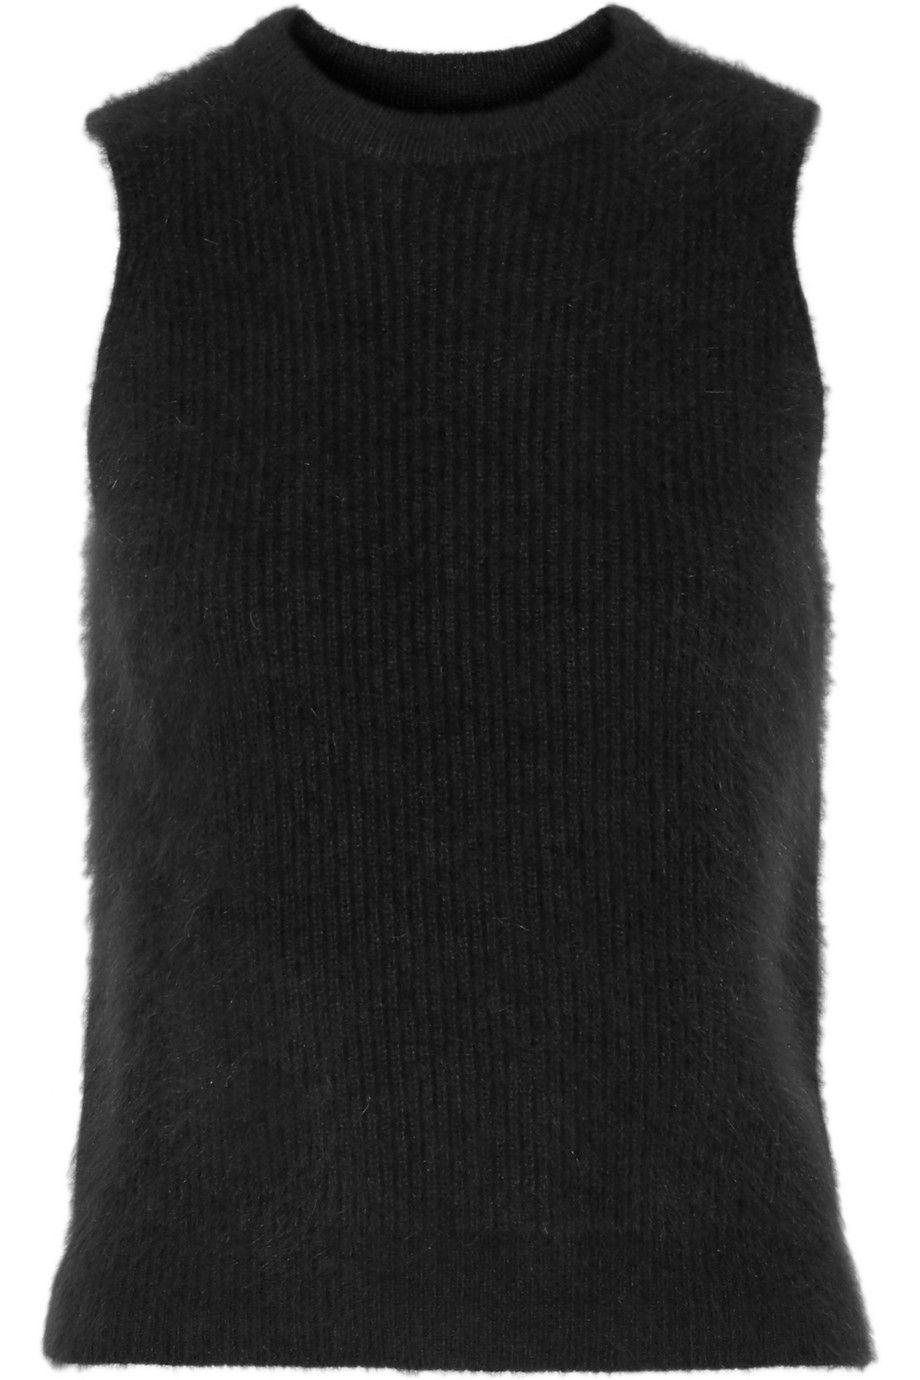 Nike Air Max FT Crew Sweatshirt ($82) ❤ liked on Polyvore